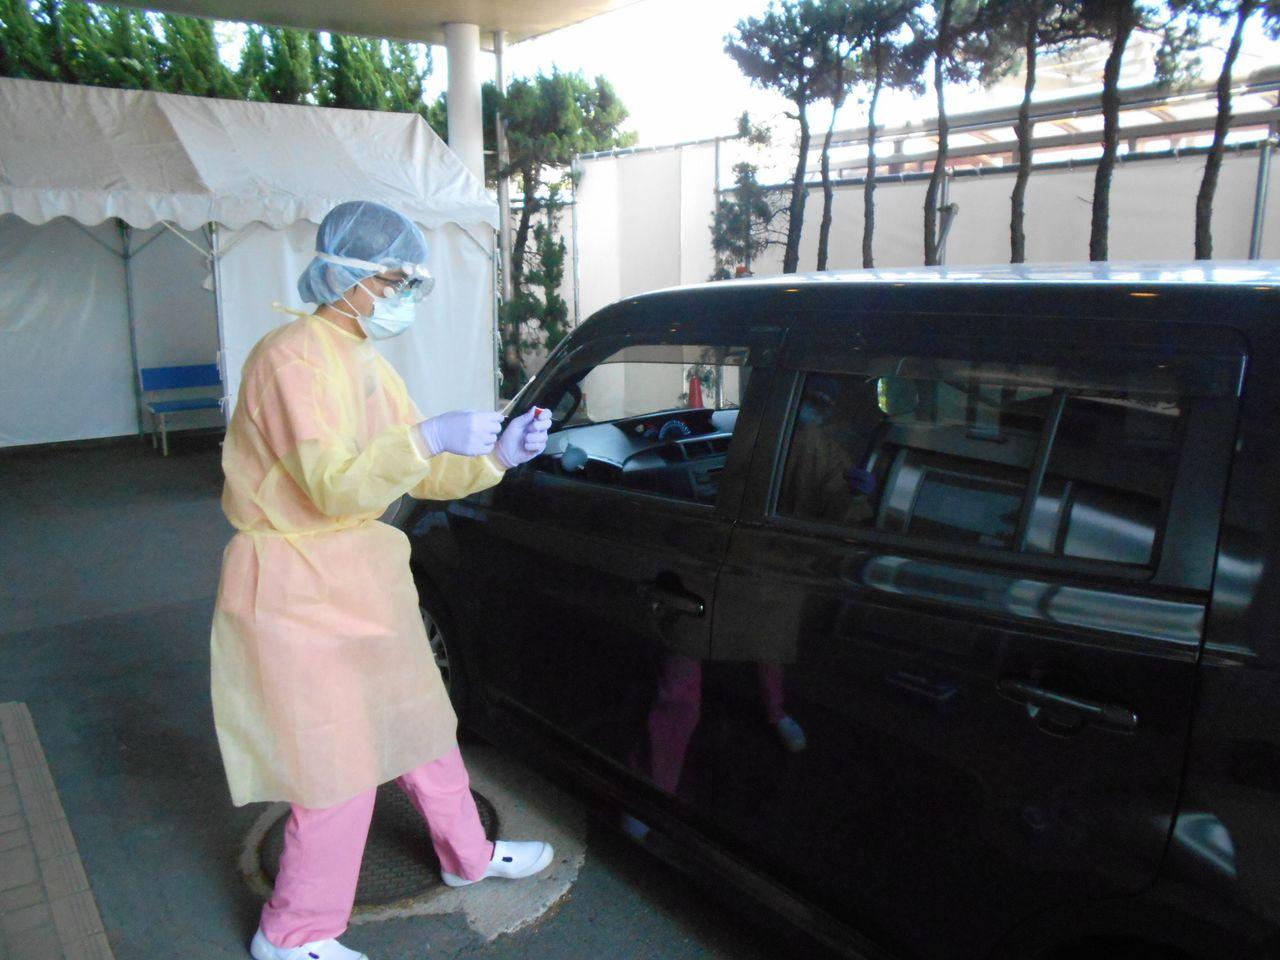 Prefektur Tottori adalah yang pertama di Jepang yang menerapkan pengujian PCR drive-through.